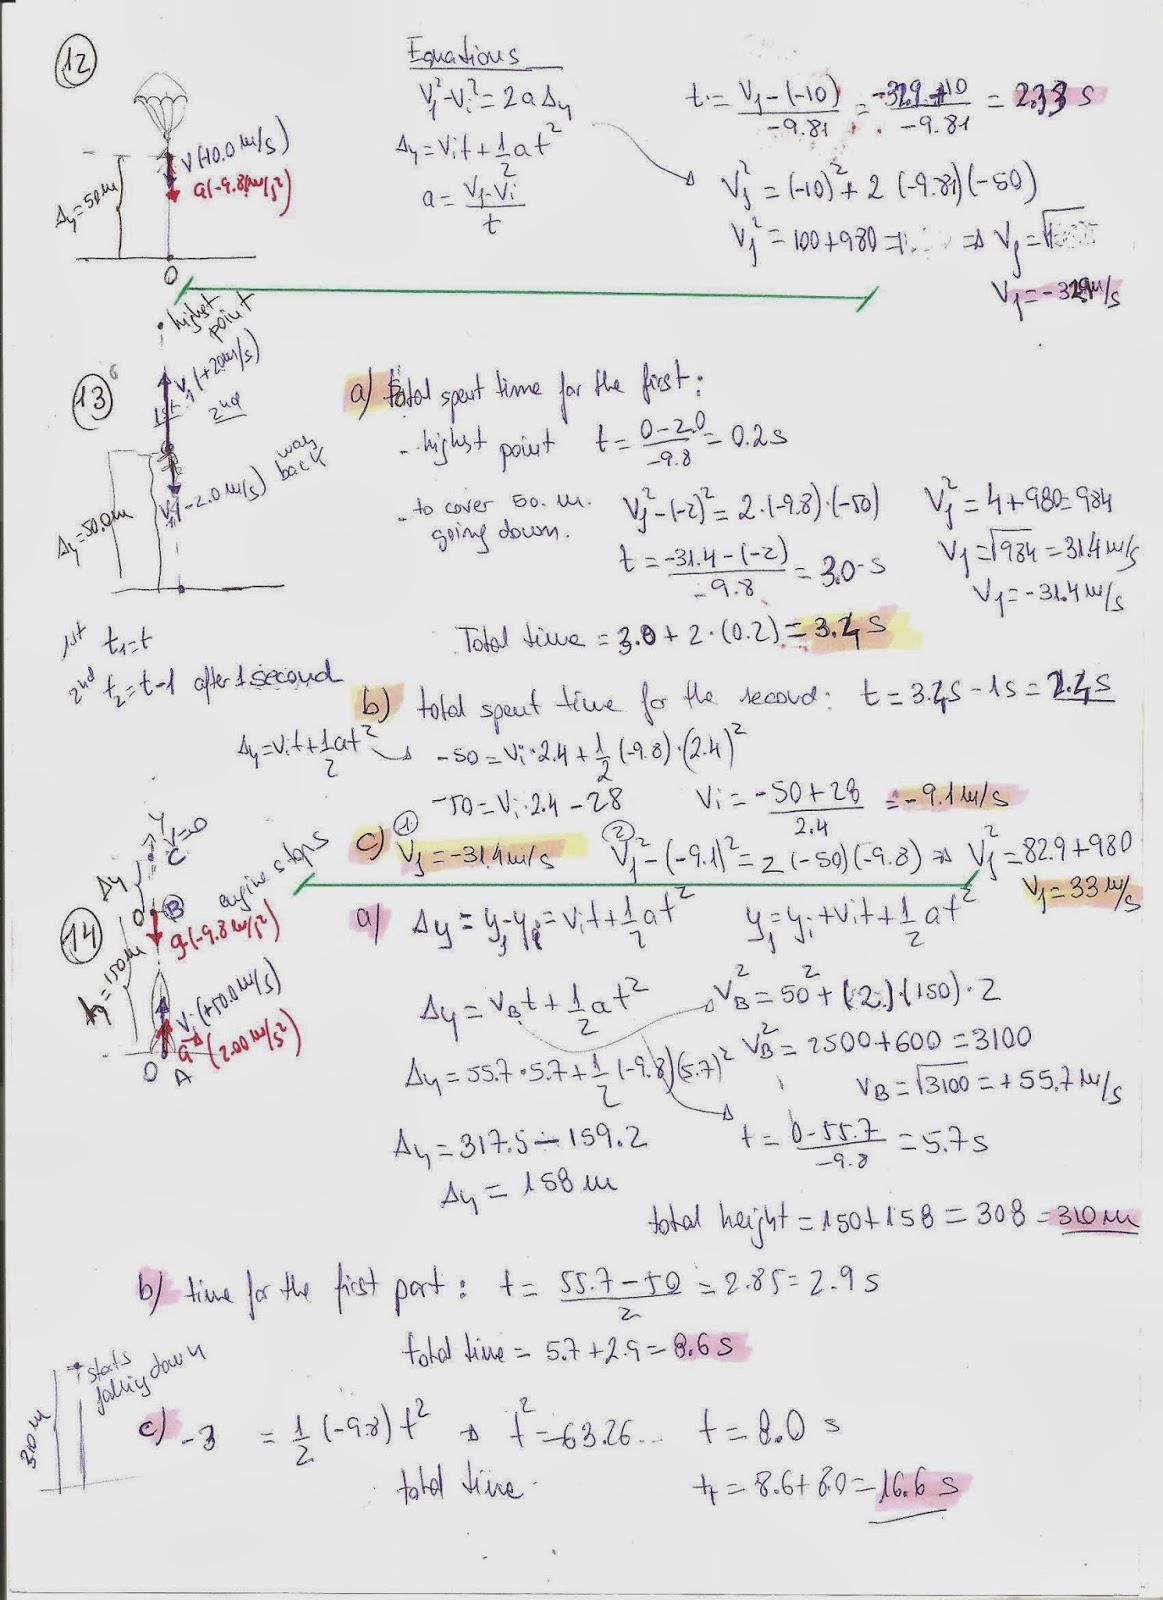 worksheet Chemistry Dimensions 2 Worksheet Solutions activity worksheet 2 solutions motion in one dimension physics dimension